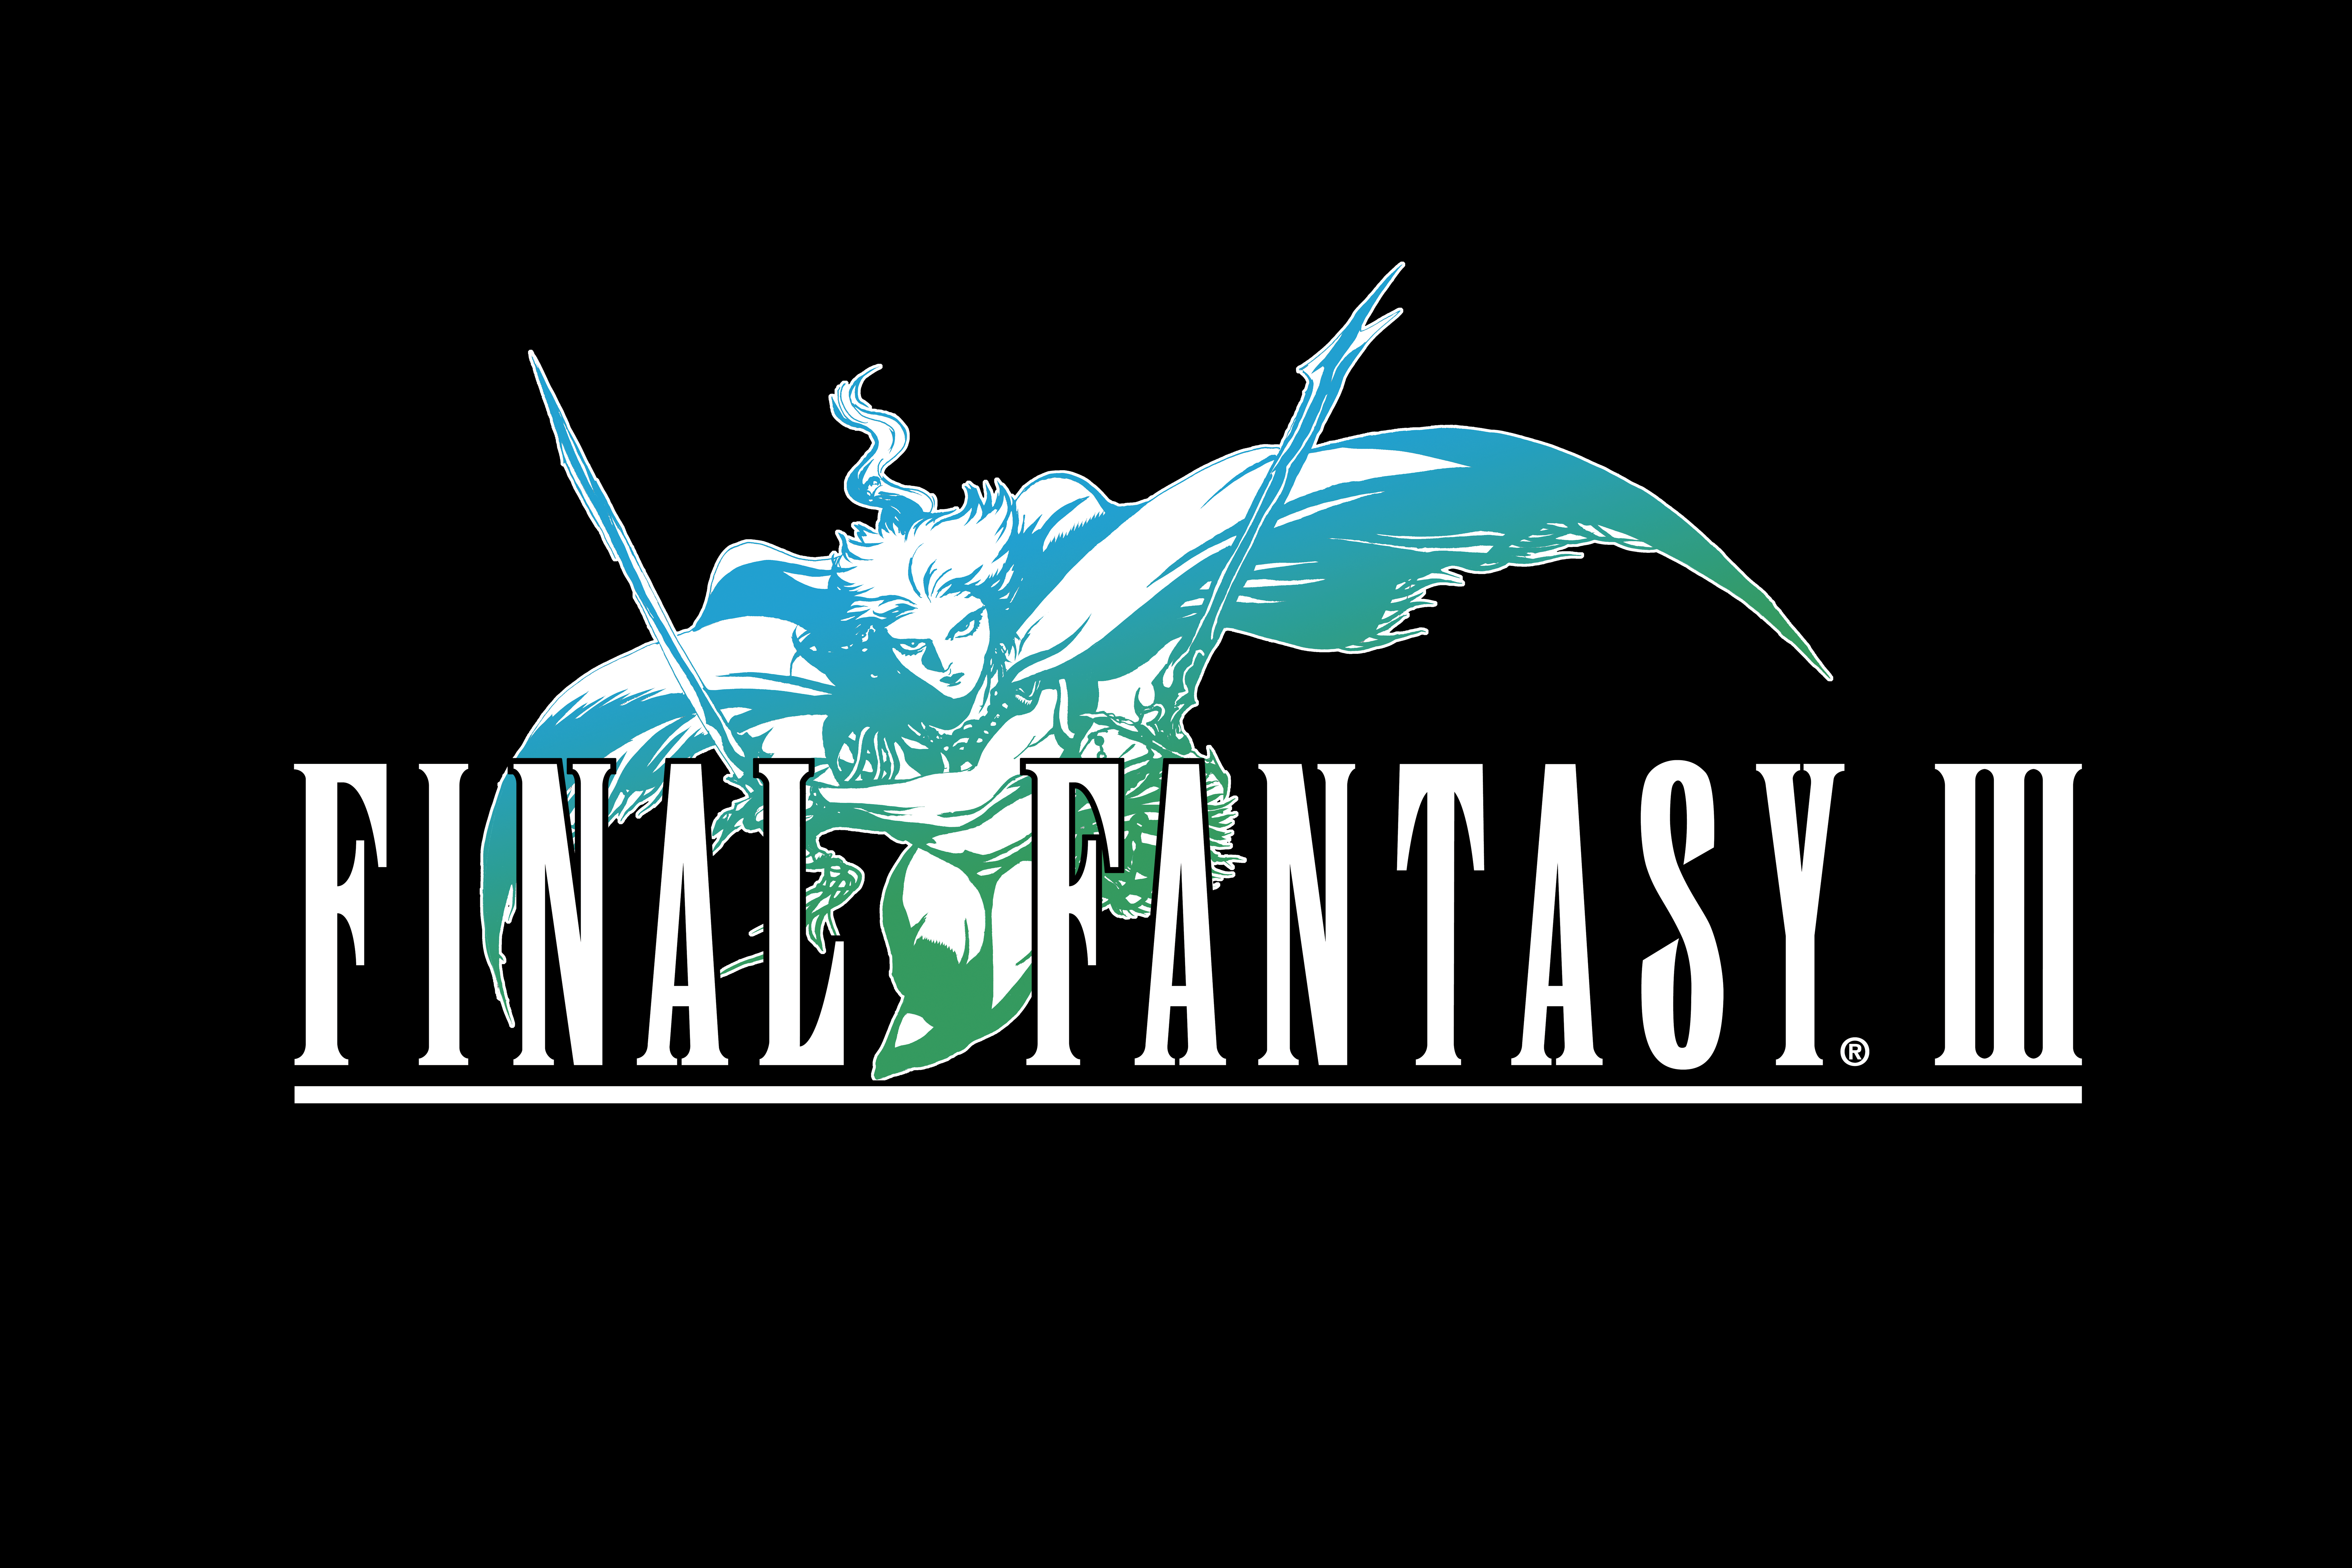 Final Fantasy III (2012) promotional art.